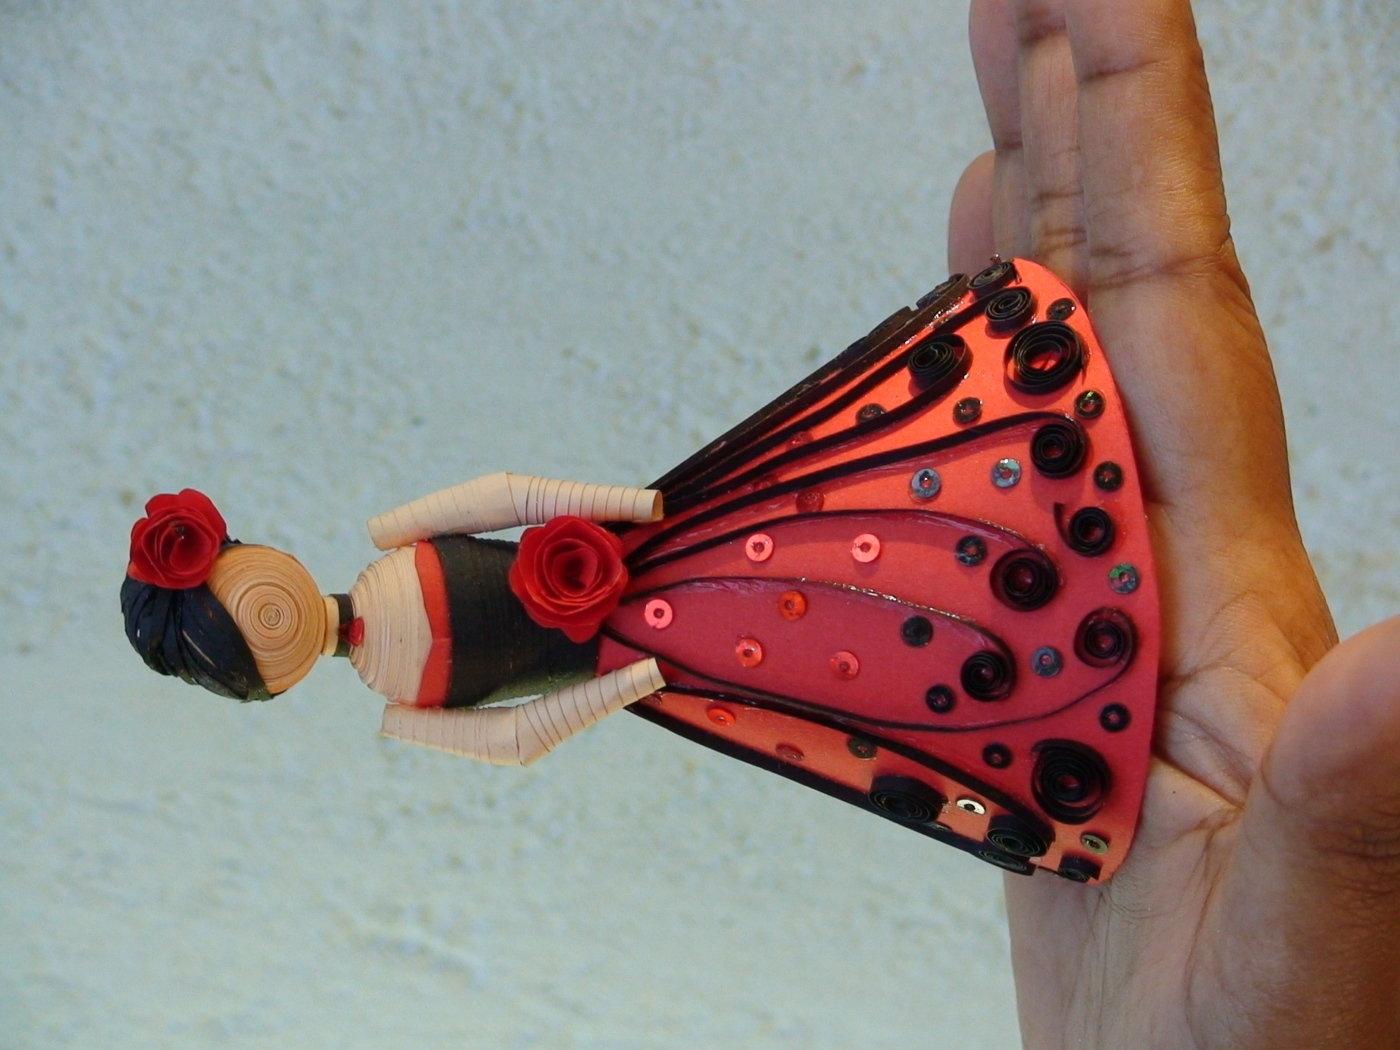 Paper Quilling Dolls By Sandy Inoka At Coroflot Com